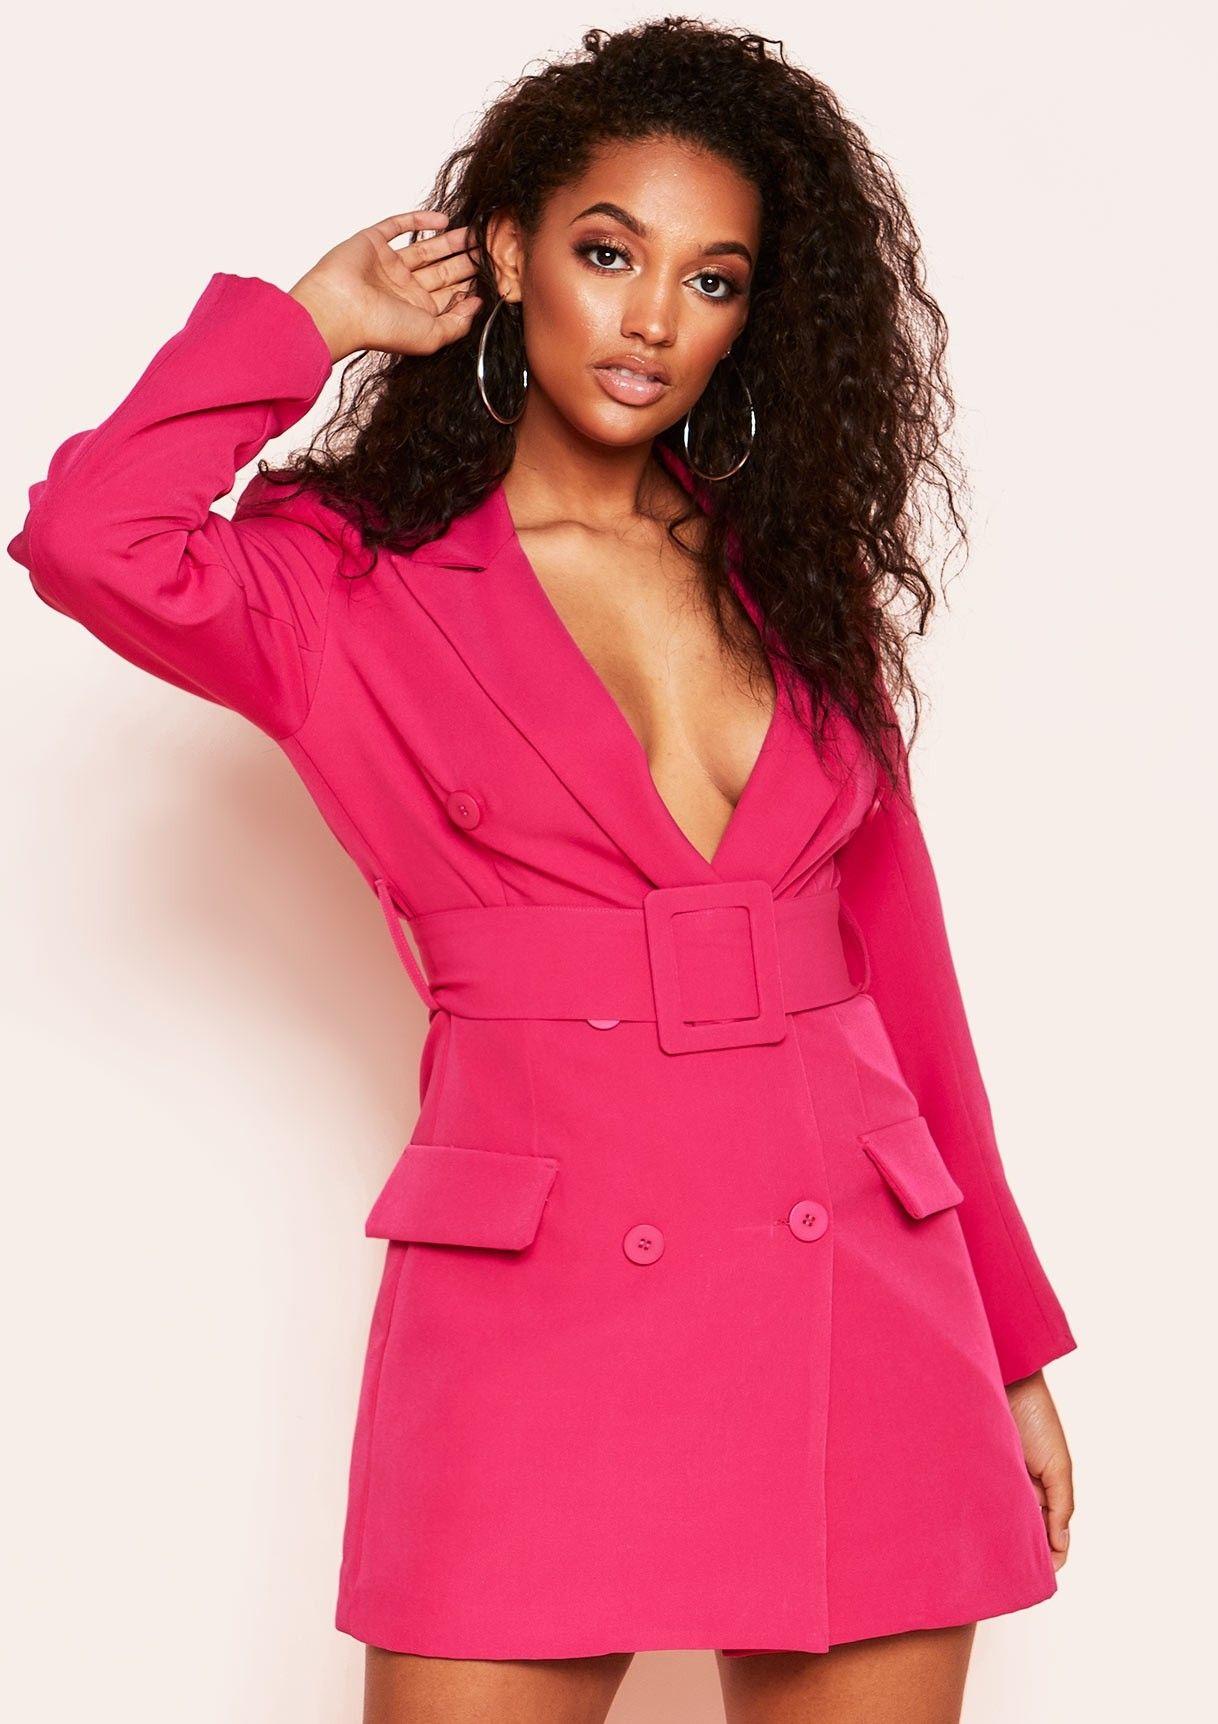 75221a0f78 Missyempire - Hena Hot Pink Belted Blazer Dress